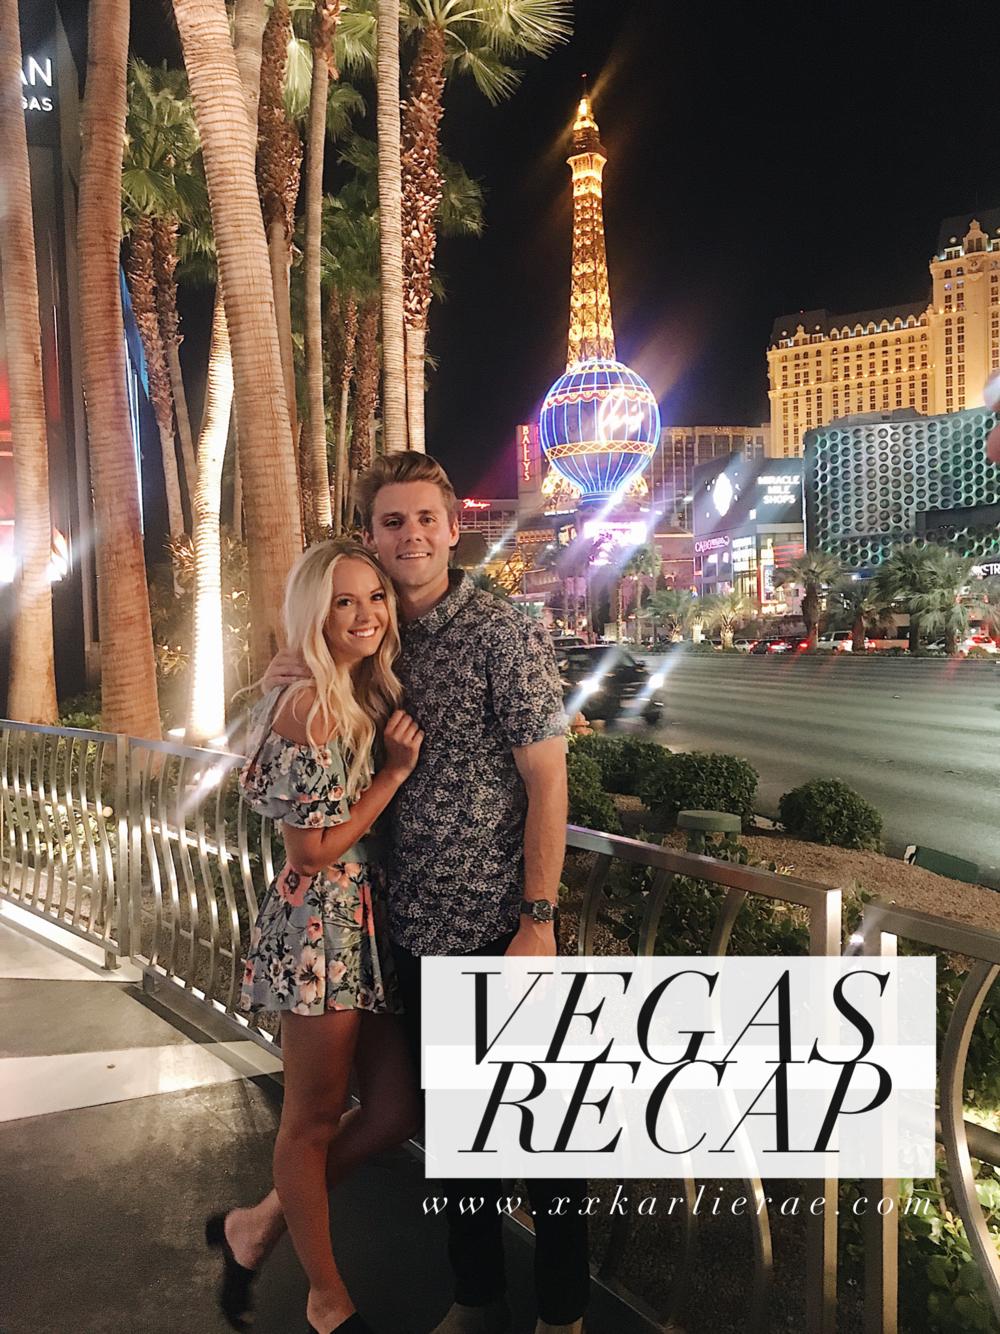 Vegas Recap | xxkarlierae.com